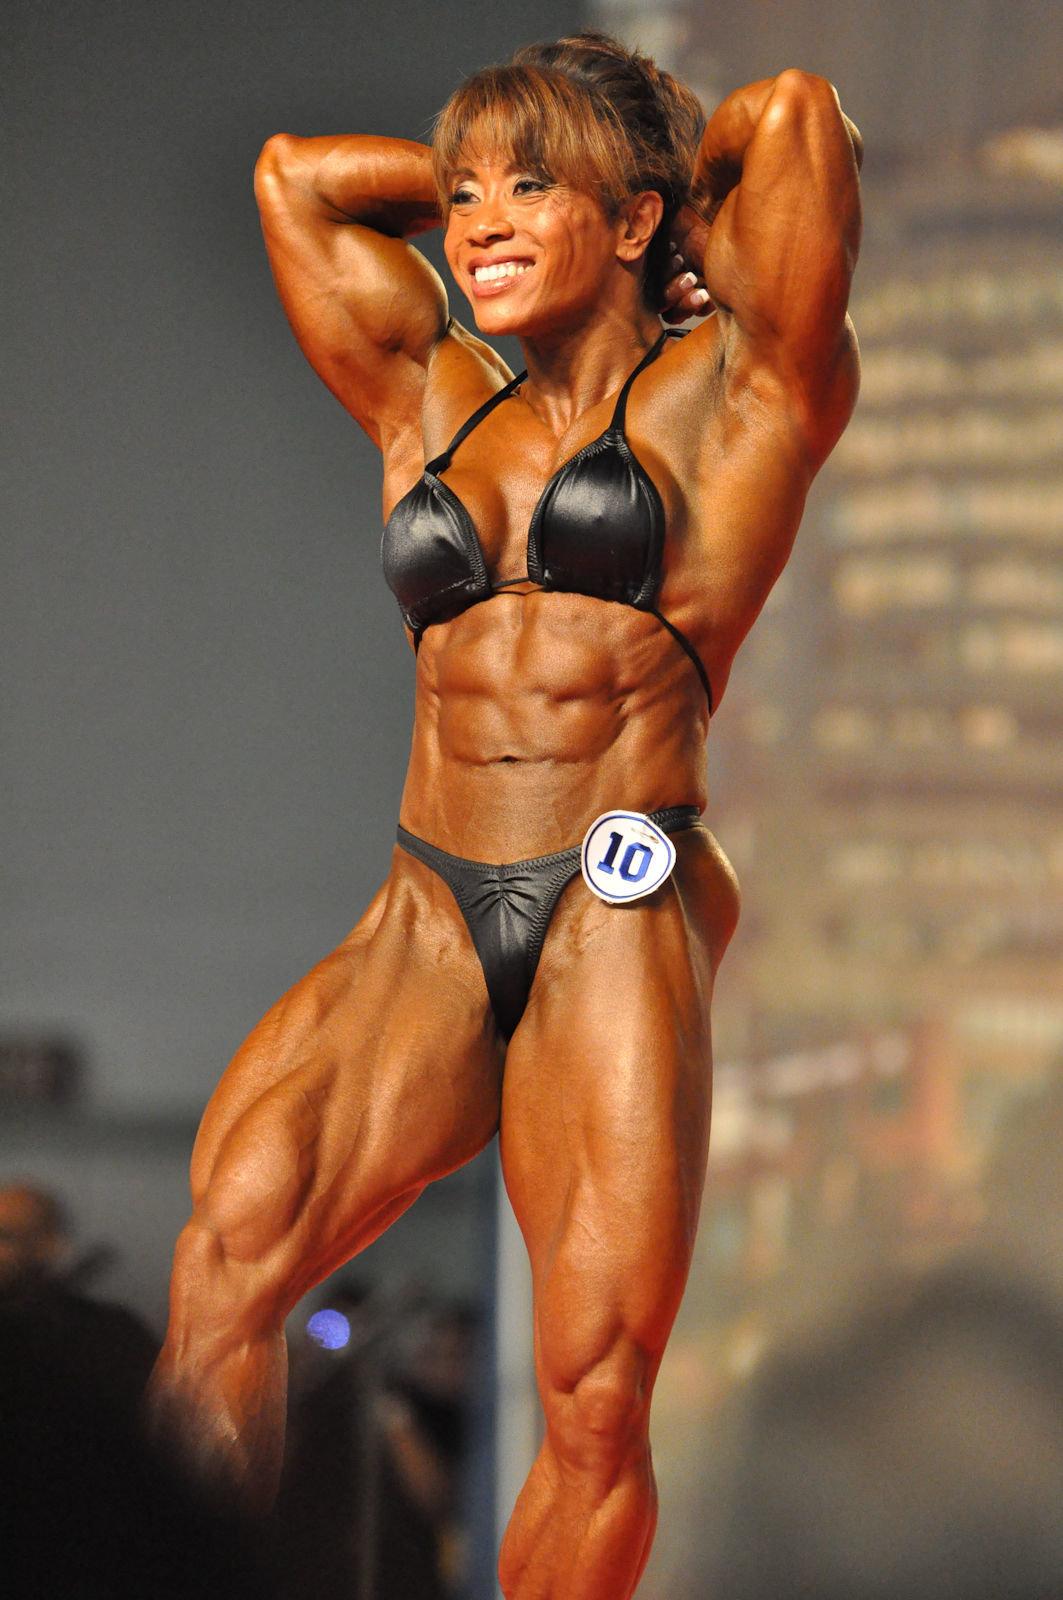 Mothers pictures senior female bodybuilders hop